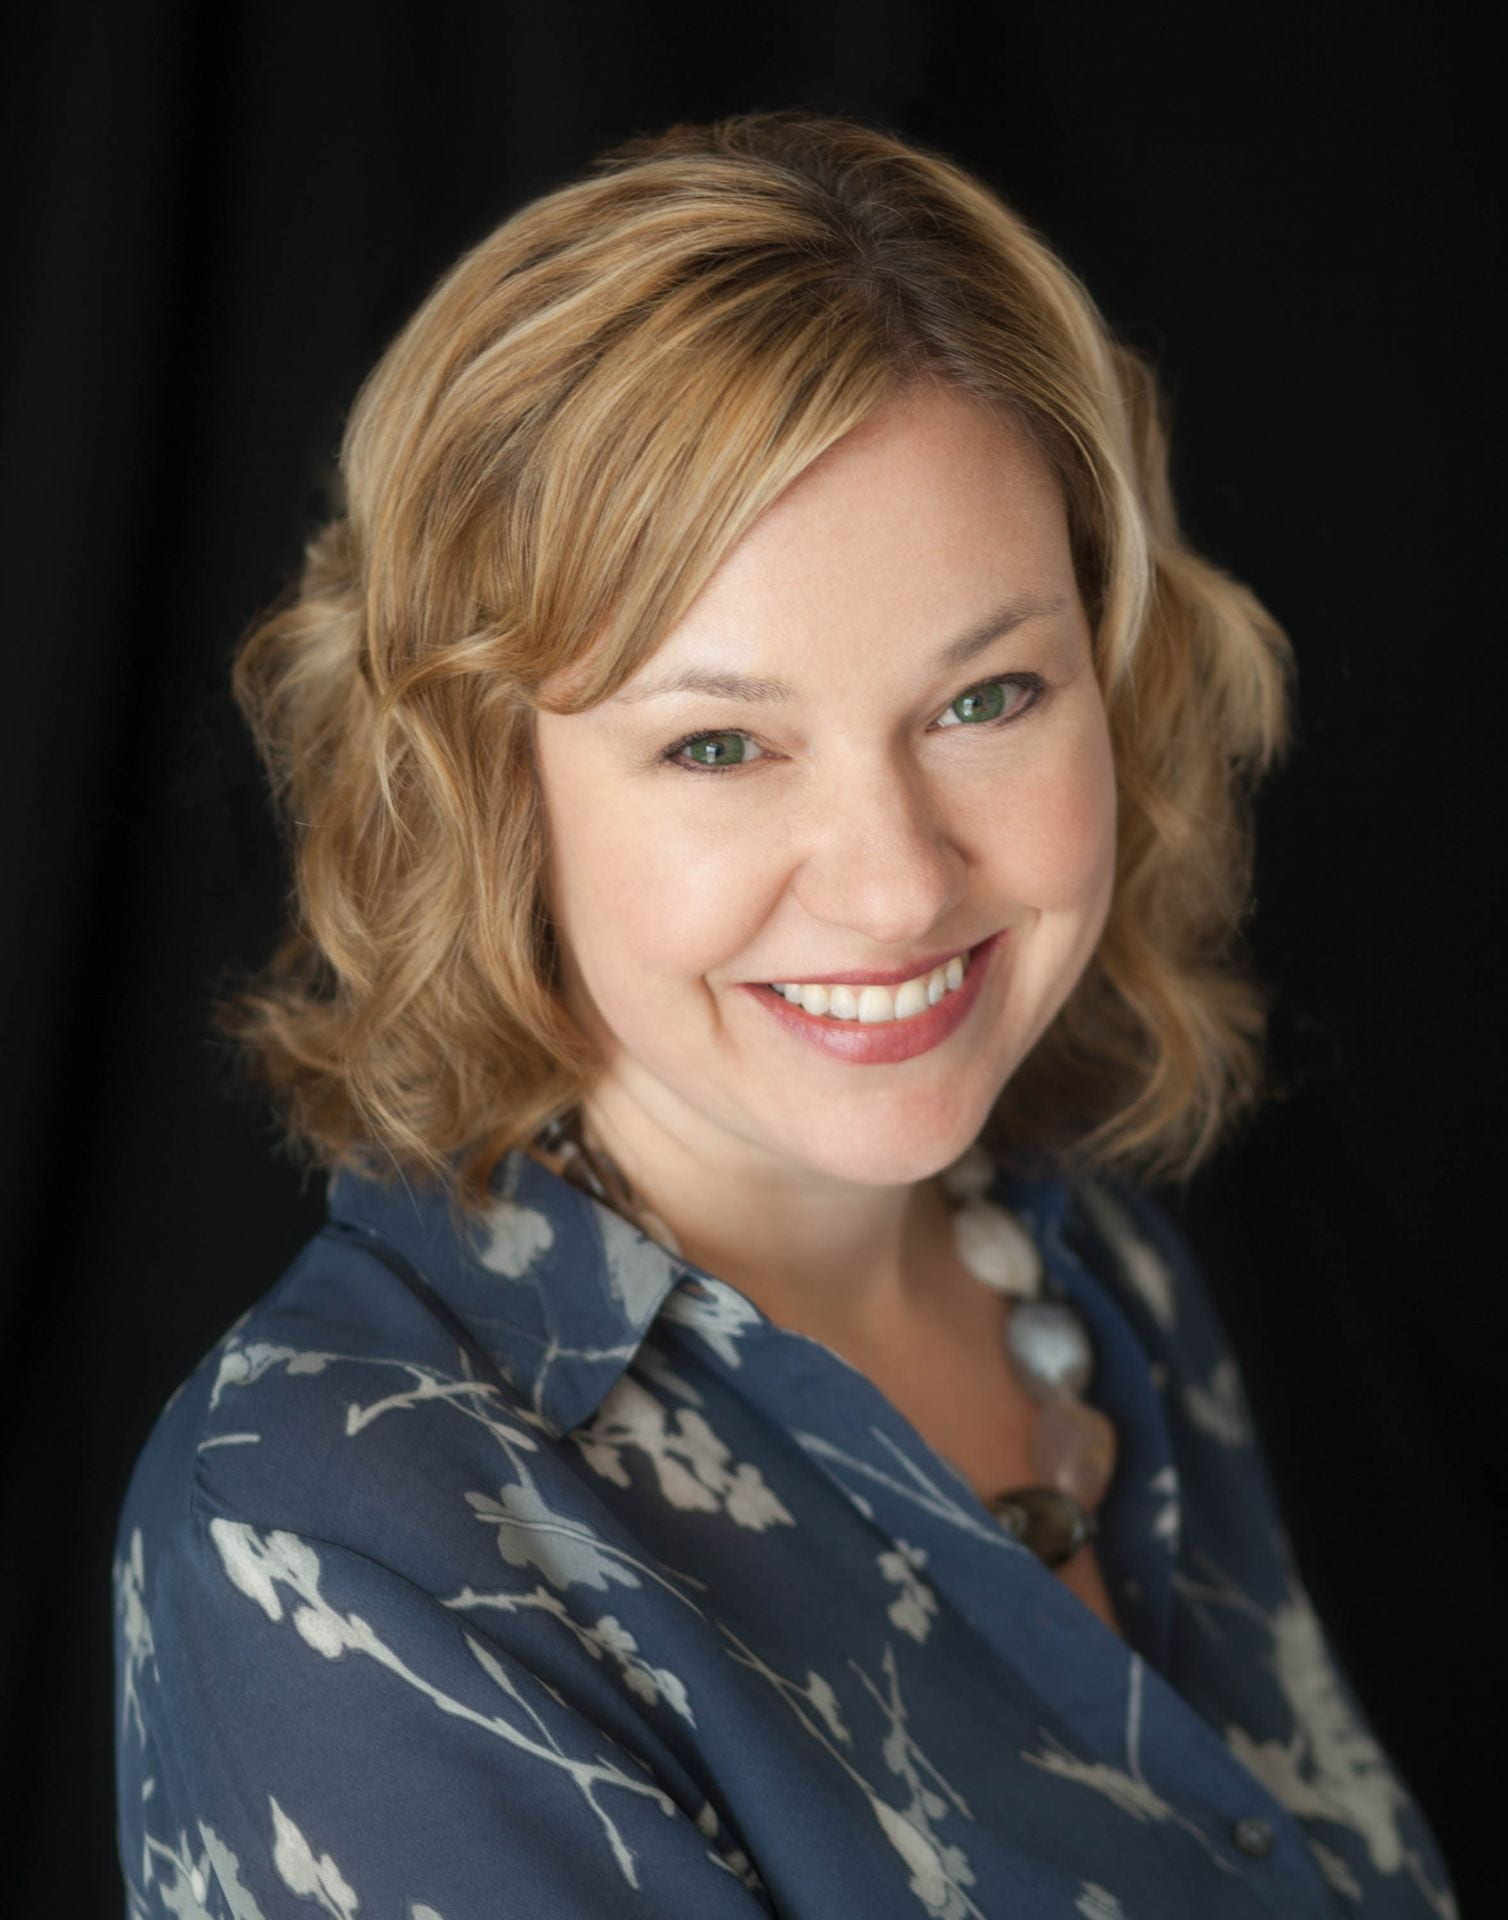 Kelly Ann Krawczyk